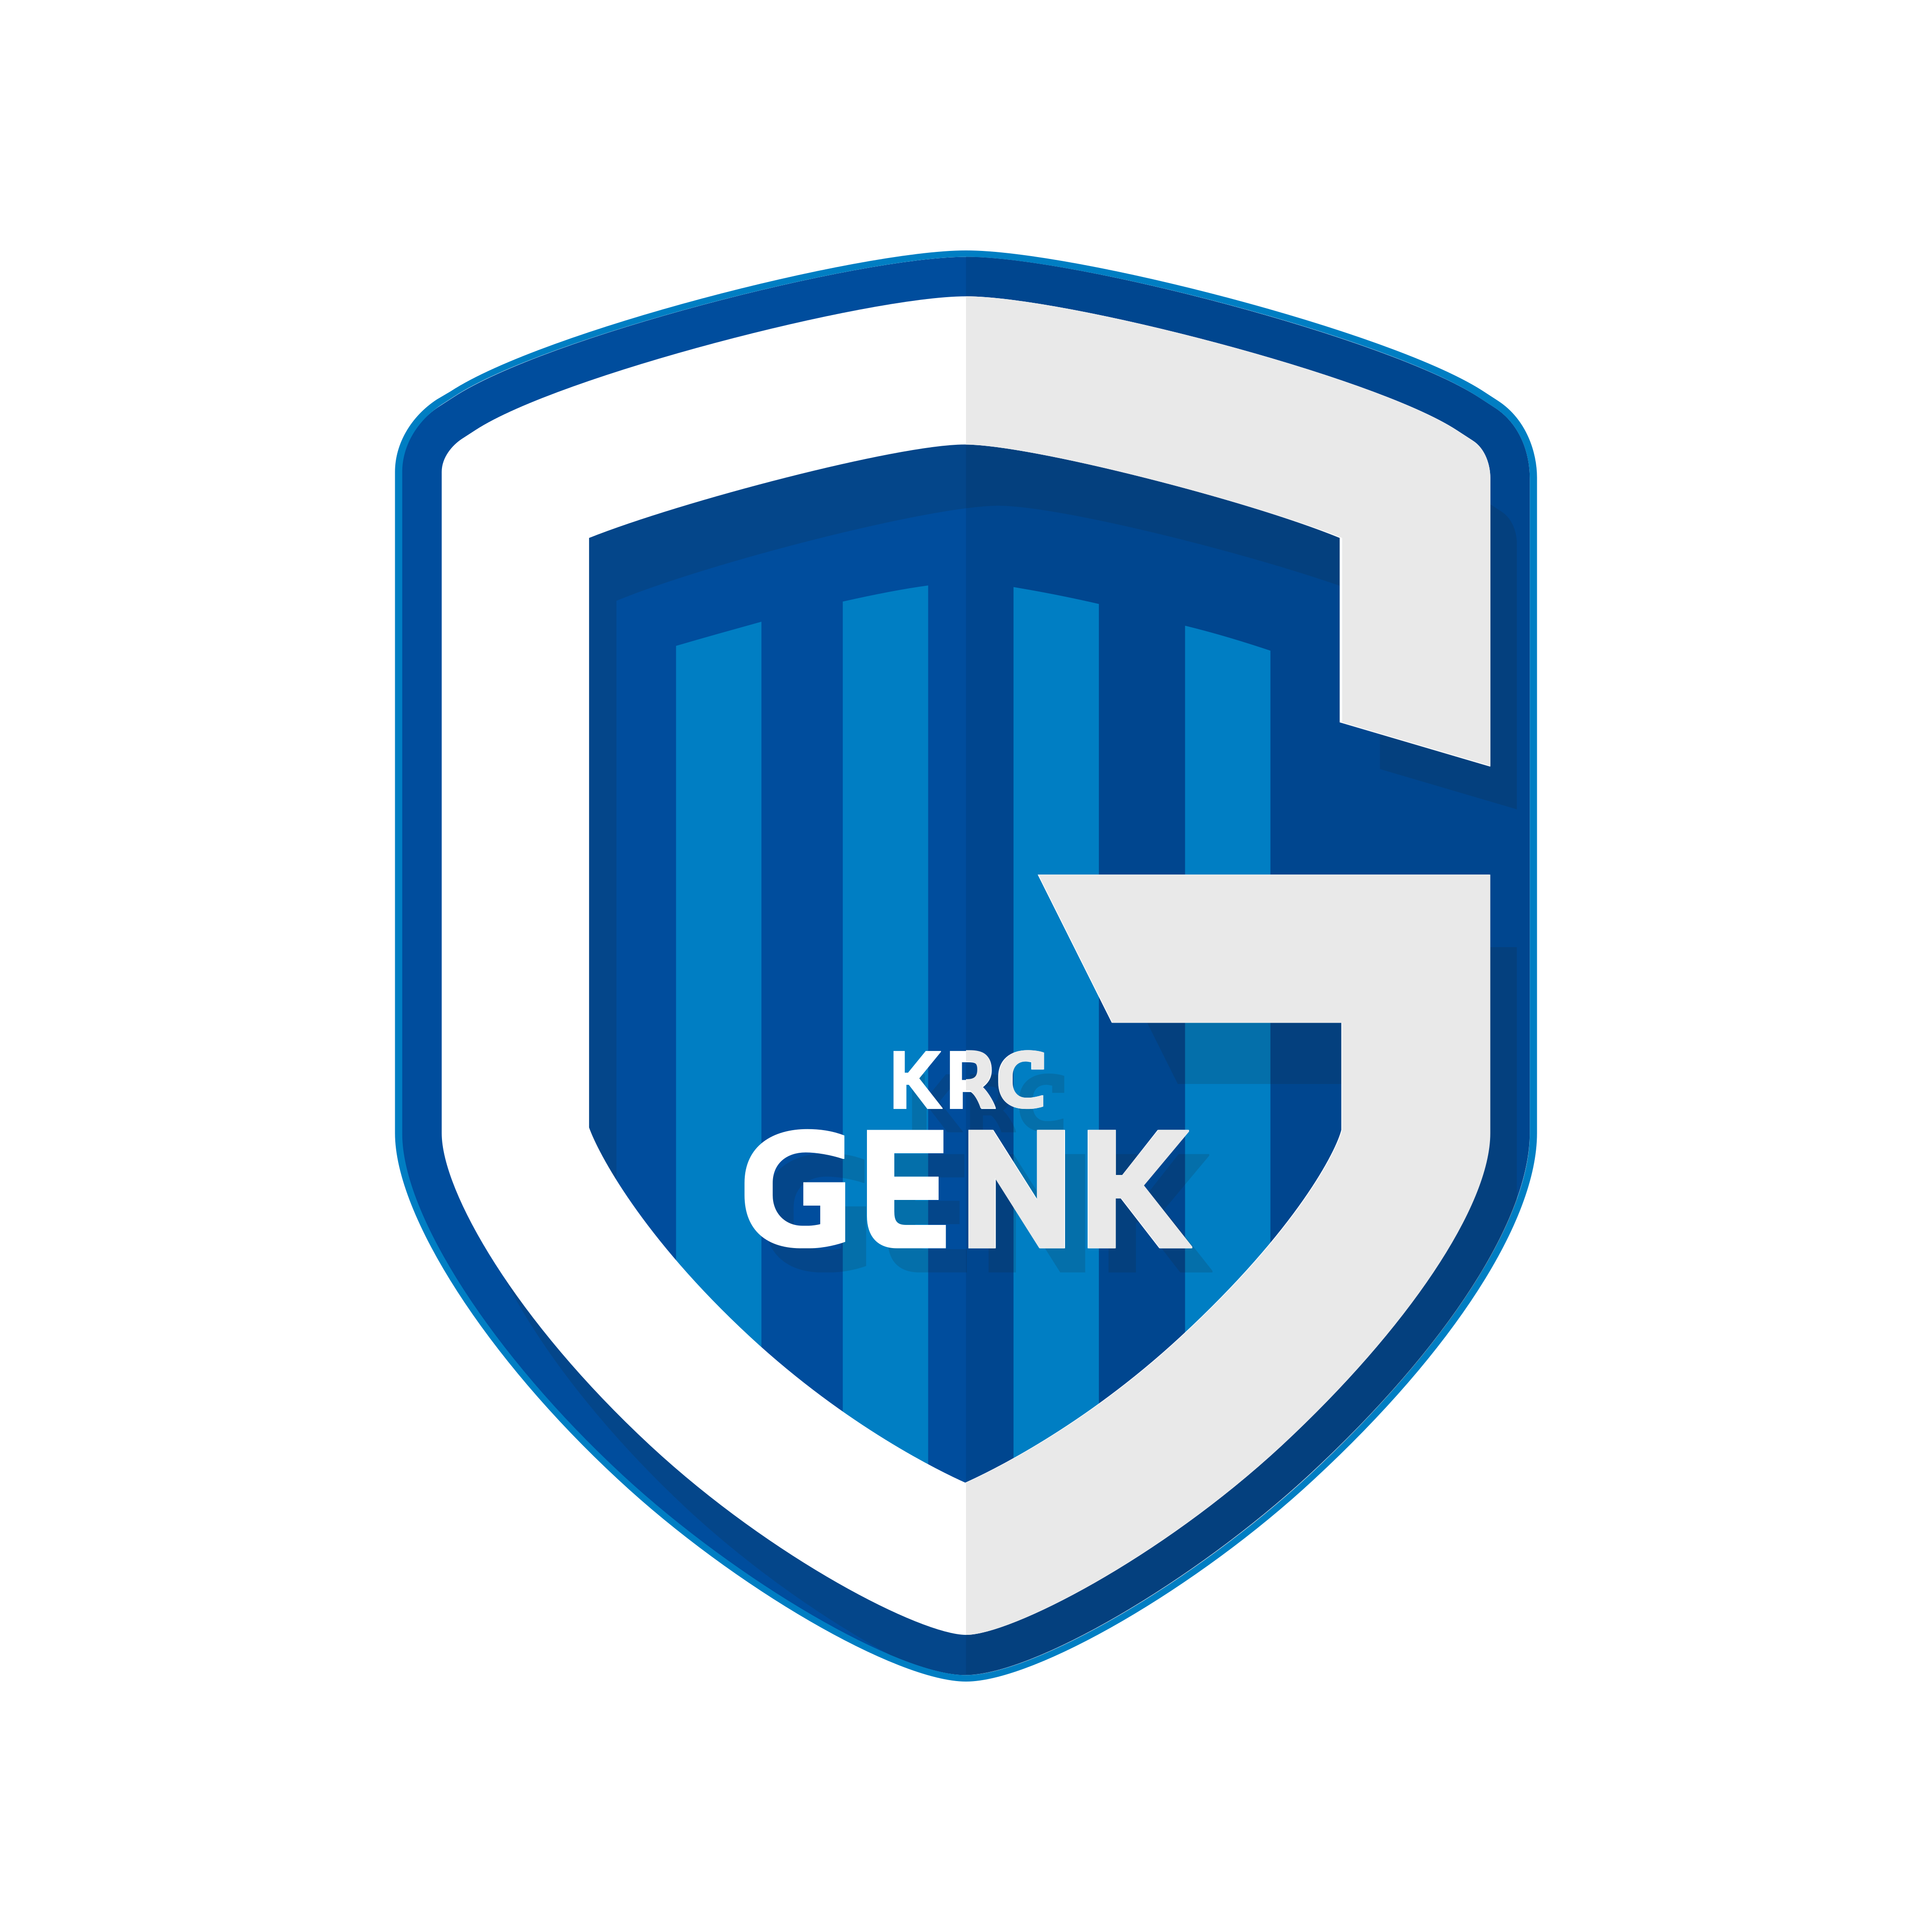 club genk logo 0 - K.R.C. Genk Logo